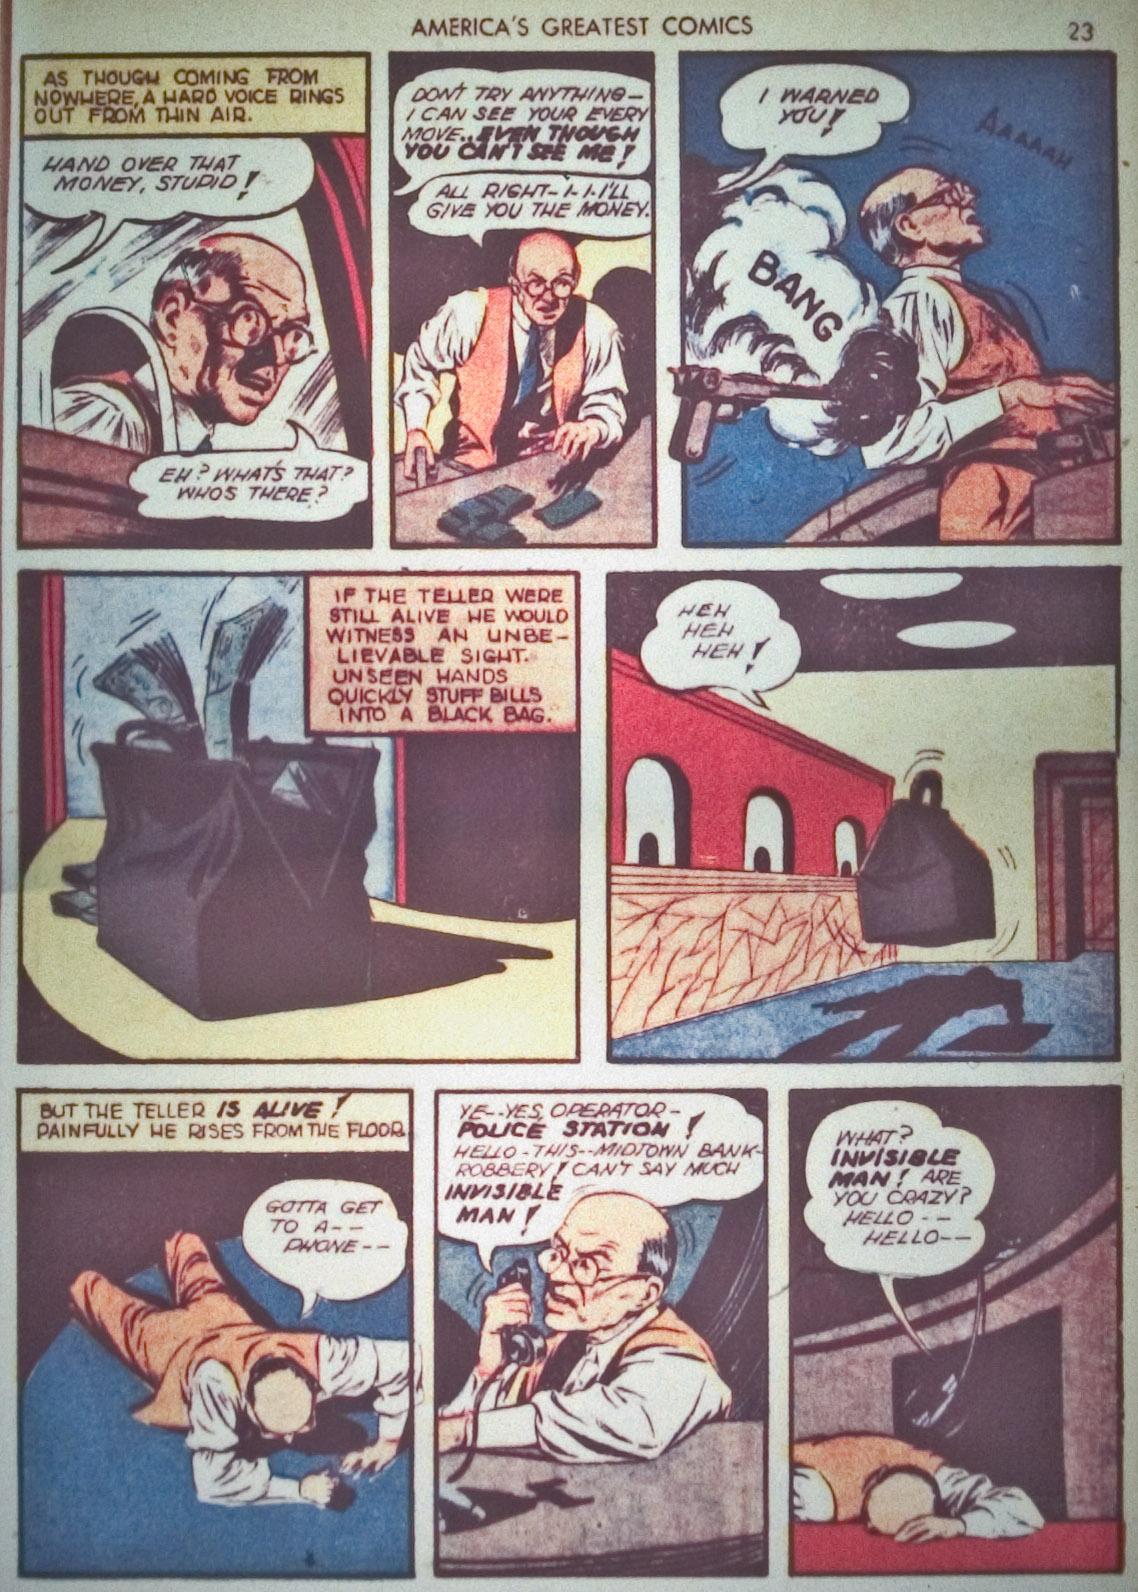 Read online America's Greatest Comics comic -  Issue #1 - 26